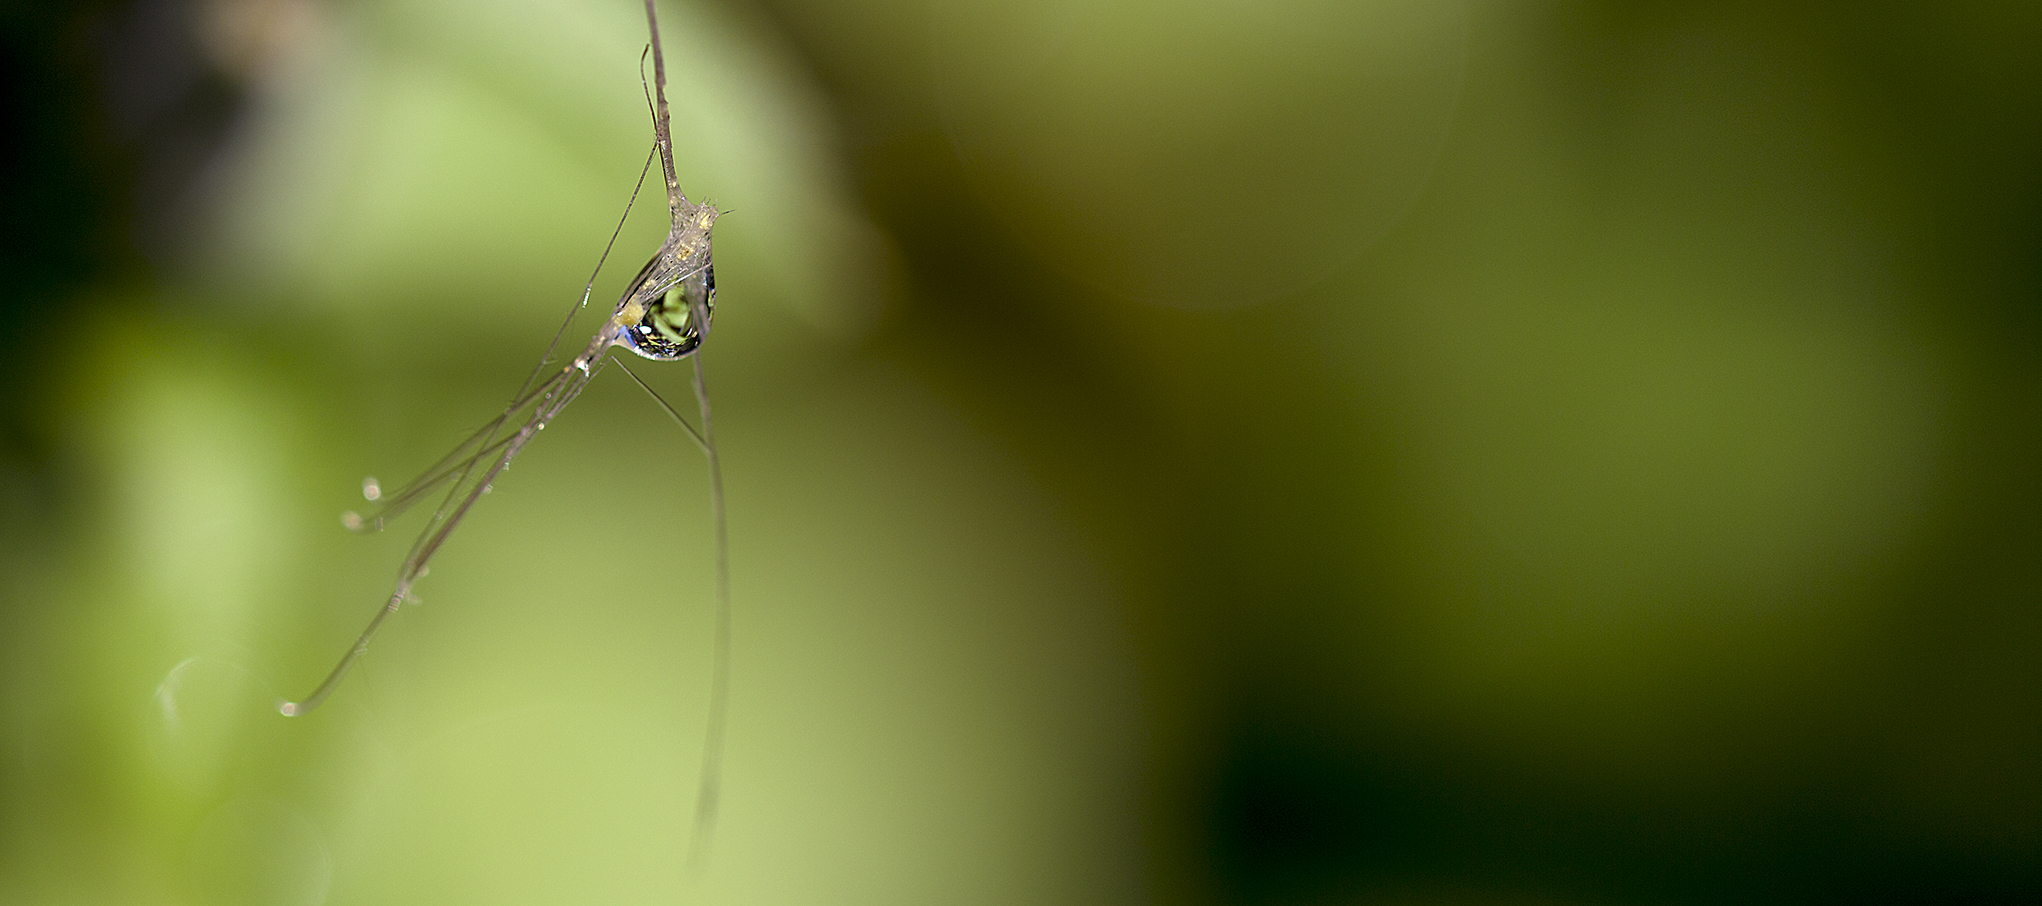 naturaliste-macro-2013-marie-colette-becker-05